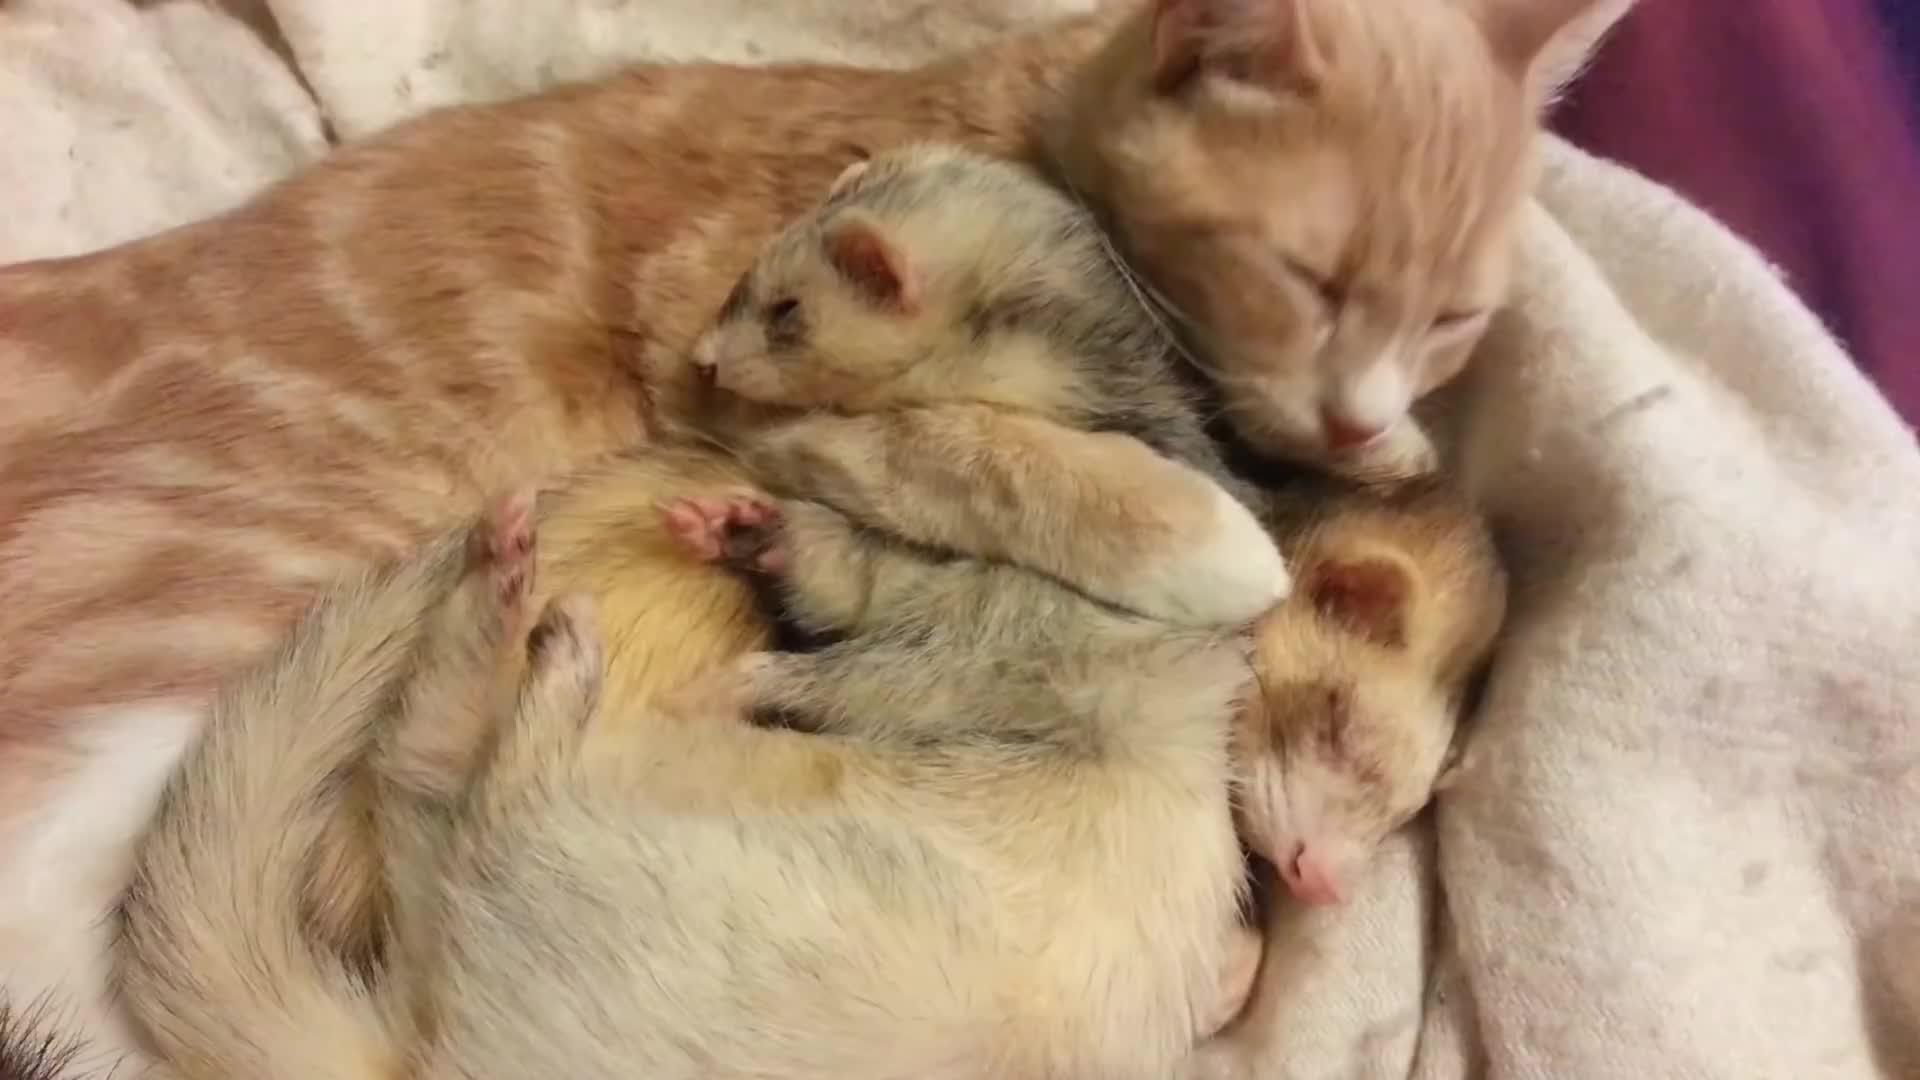 bath, cat, cuddle, cuddling, cute, ferret, ferrets, friends, funny, kitten, kitty, lick, Ned giving the ferrets a bath GIFs